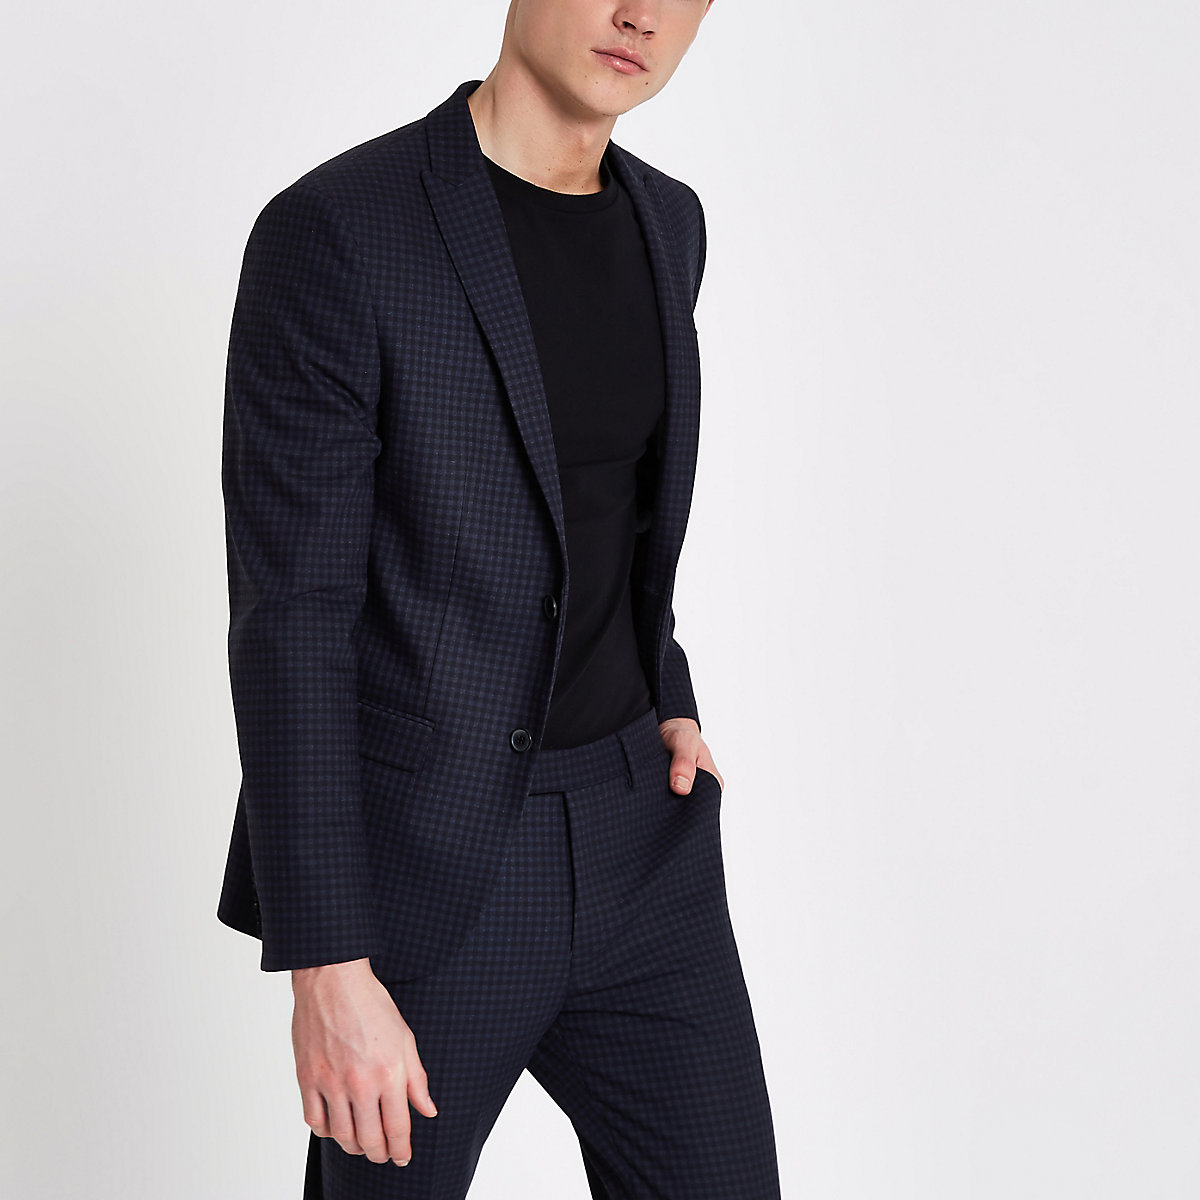 Blue check skinny fit suit jacket